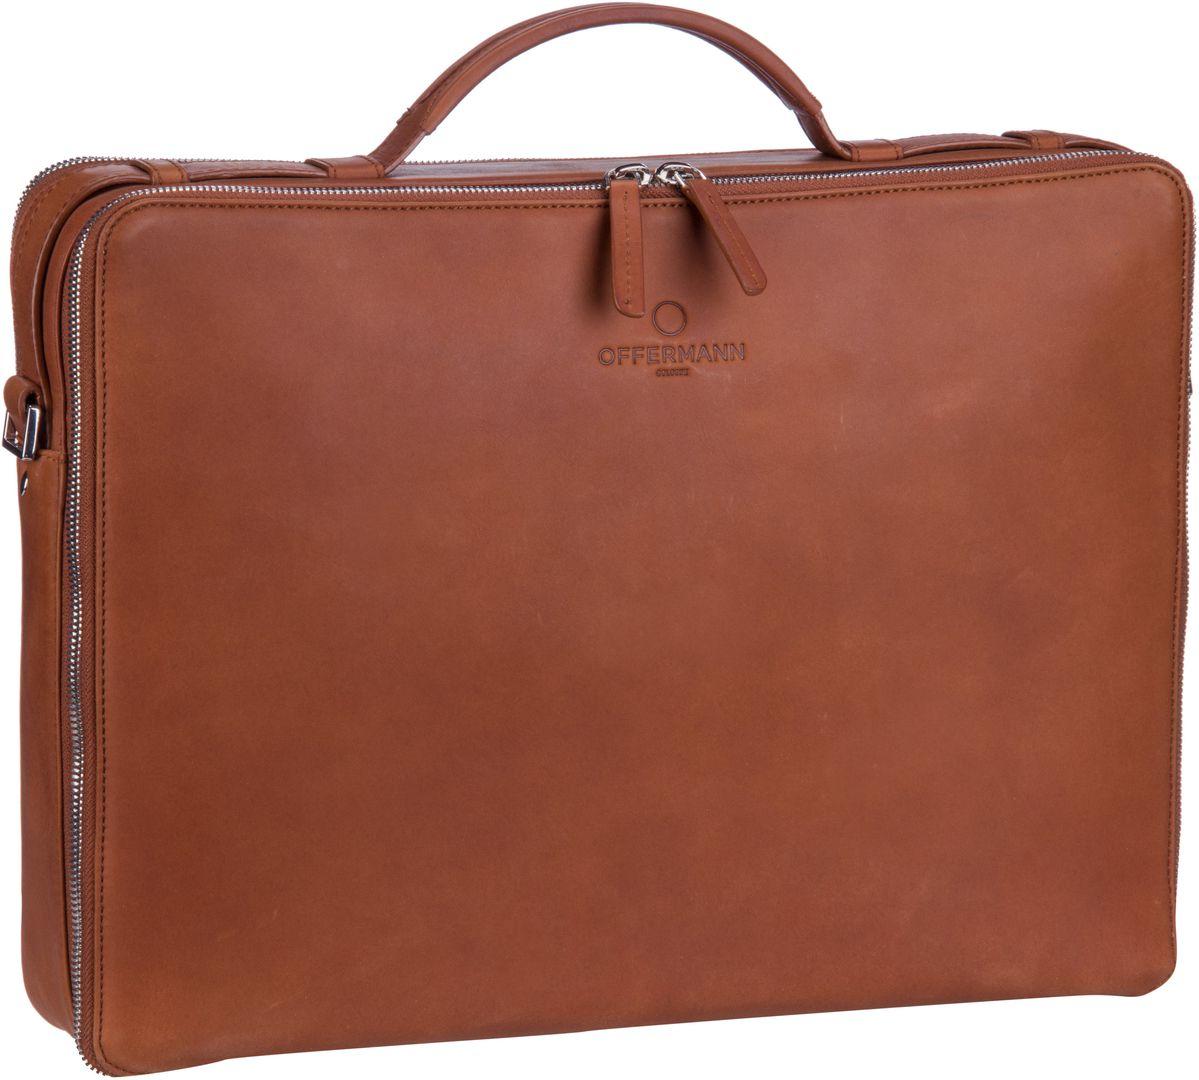 Offermann Workbag L Fine Cognac - Aktentasche